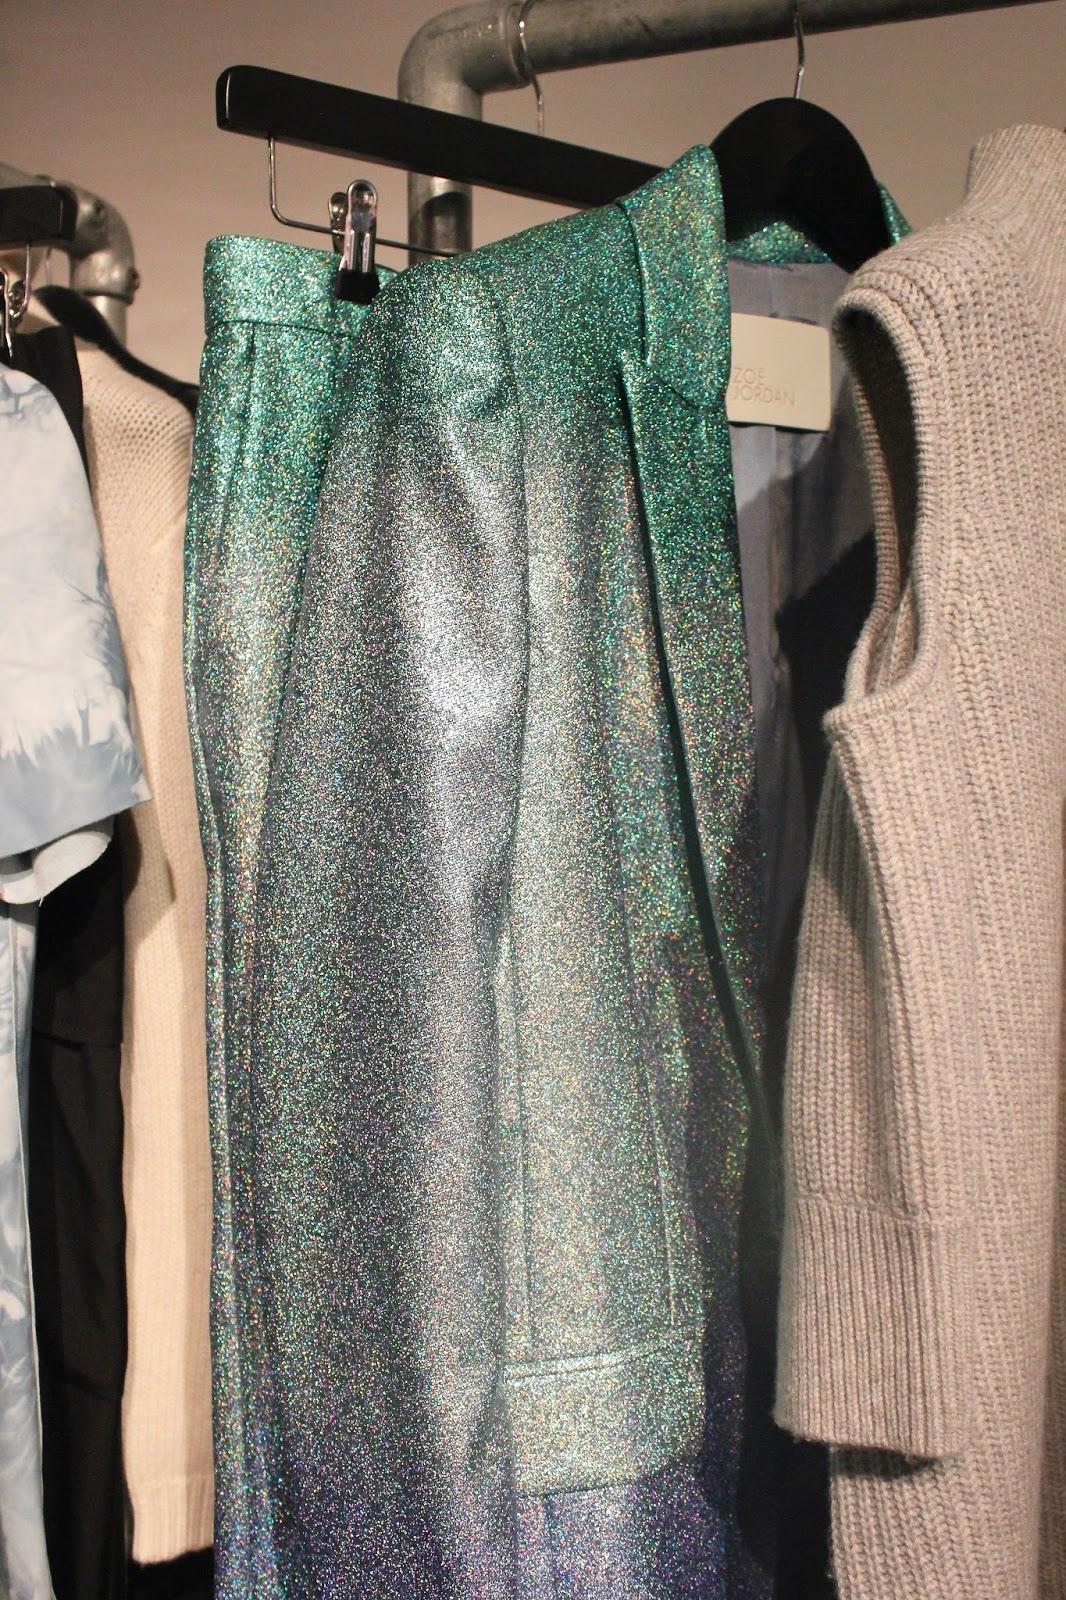 Georgie Minter-Brown, actress, blogger, london fashion week, designer showrooms, designer, clothes, fashion, zoe jordan